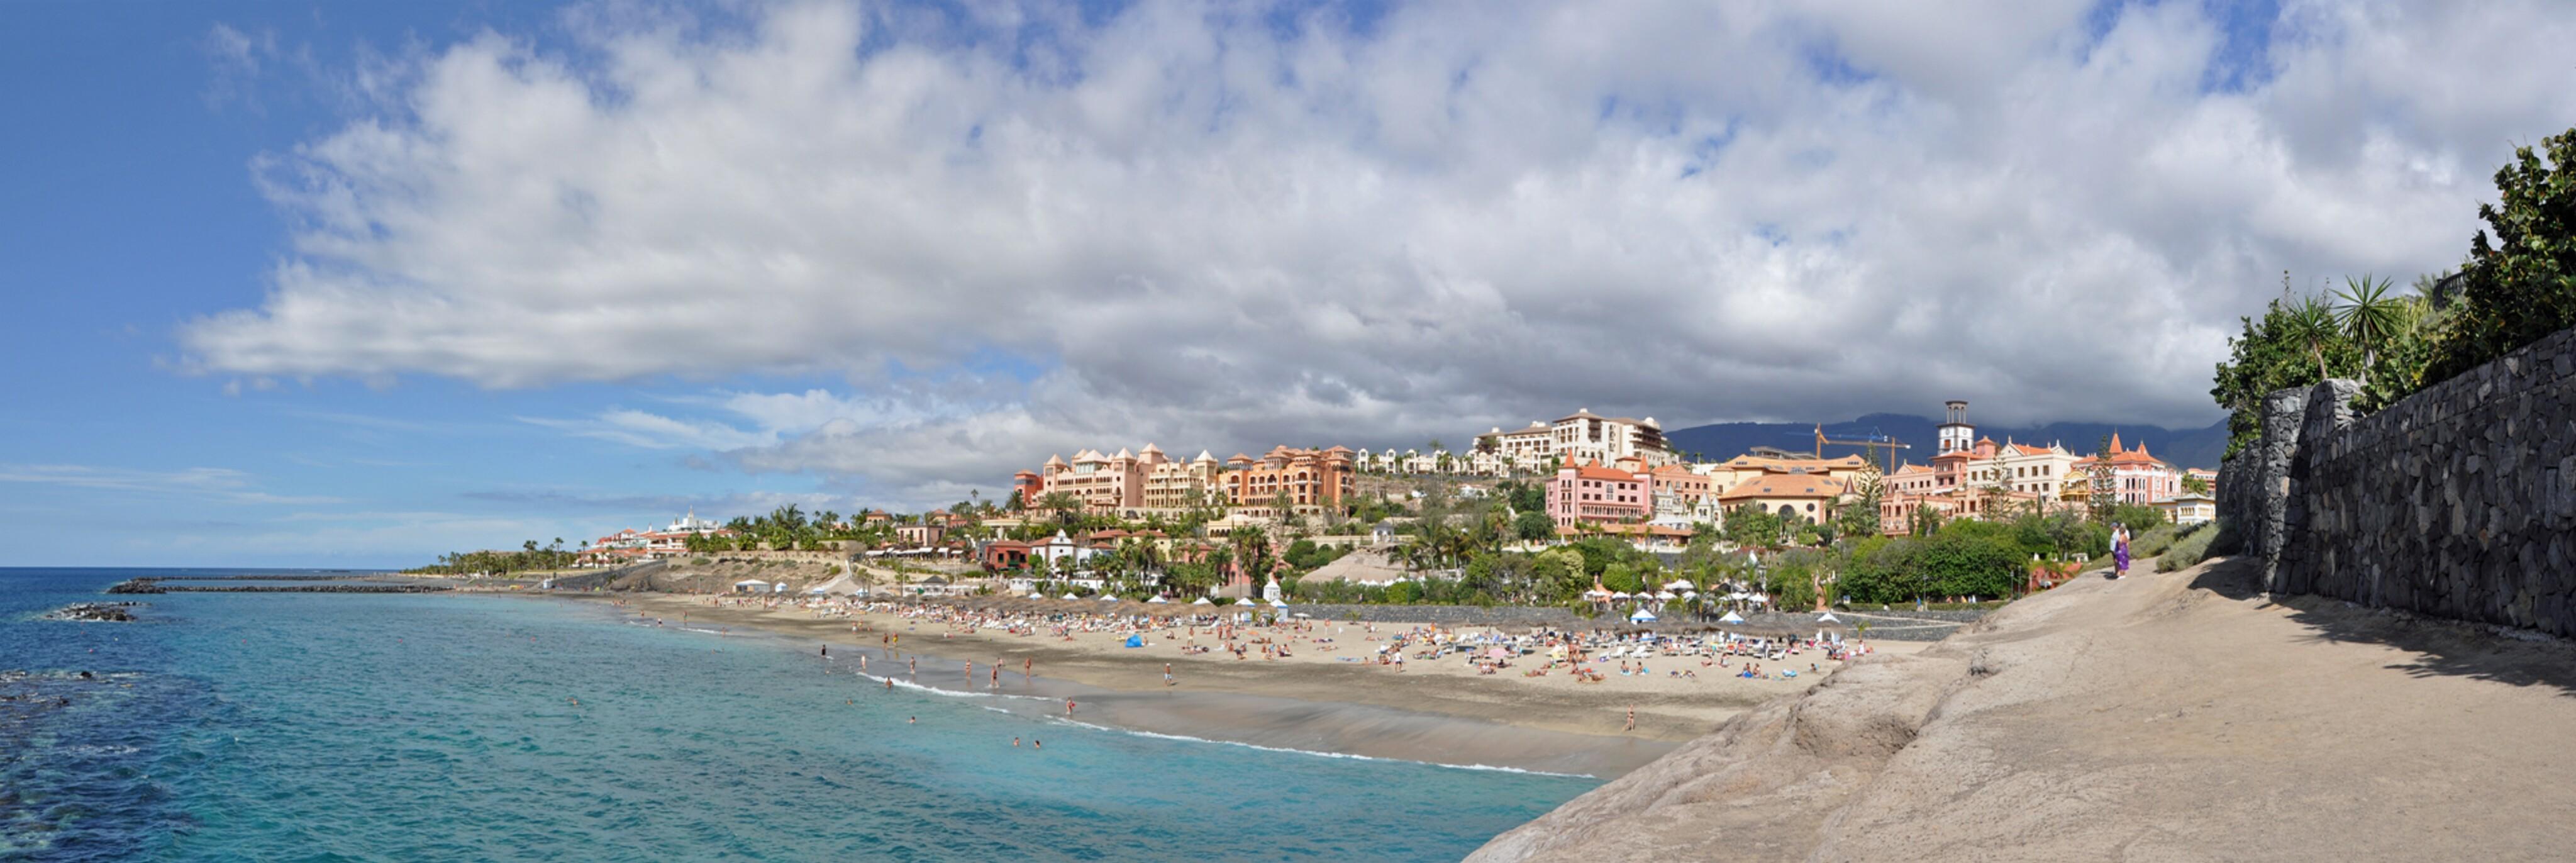 El Duque Beach, Tenerife